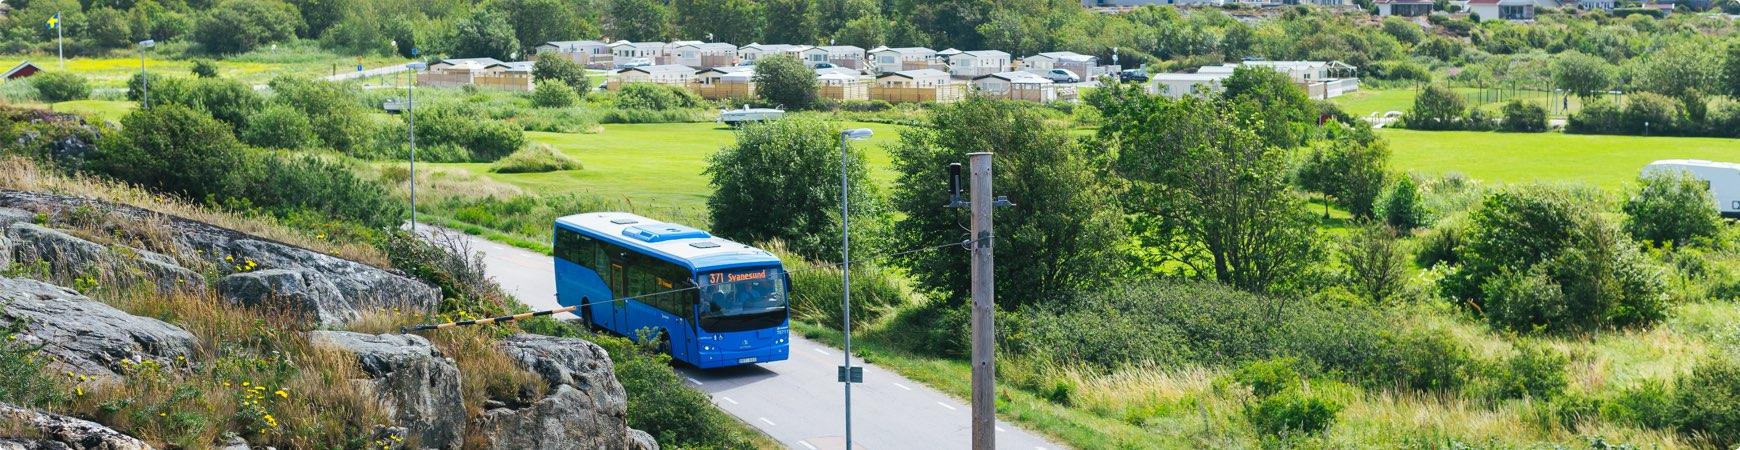 blå buss kör på landsbygd